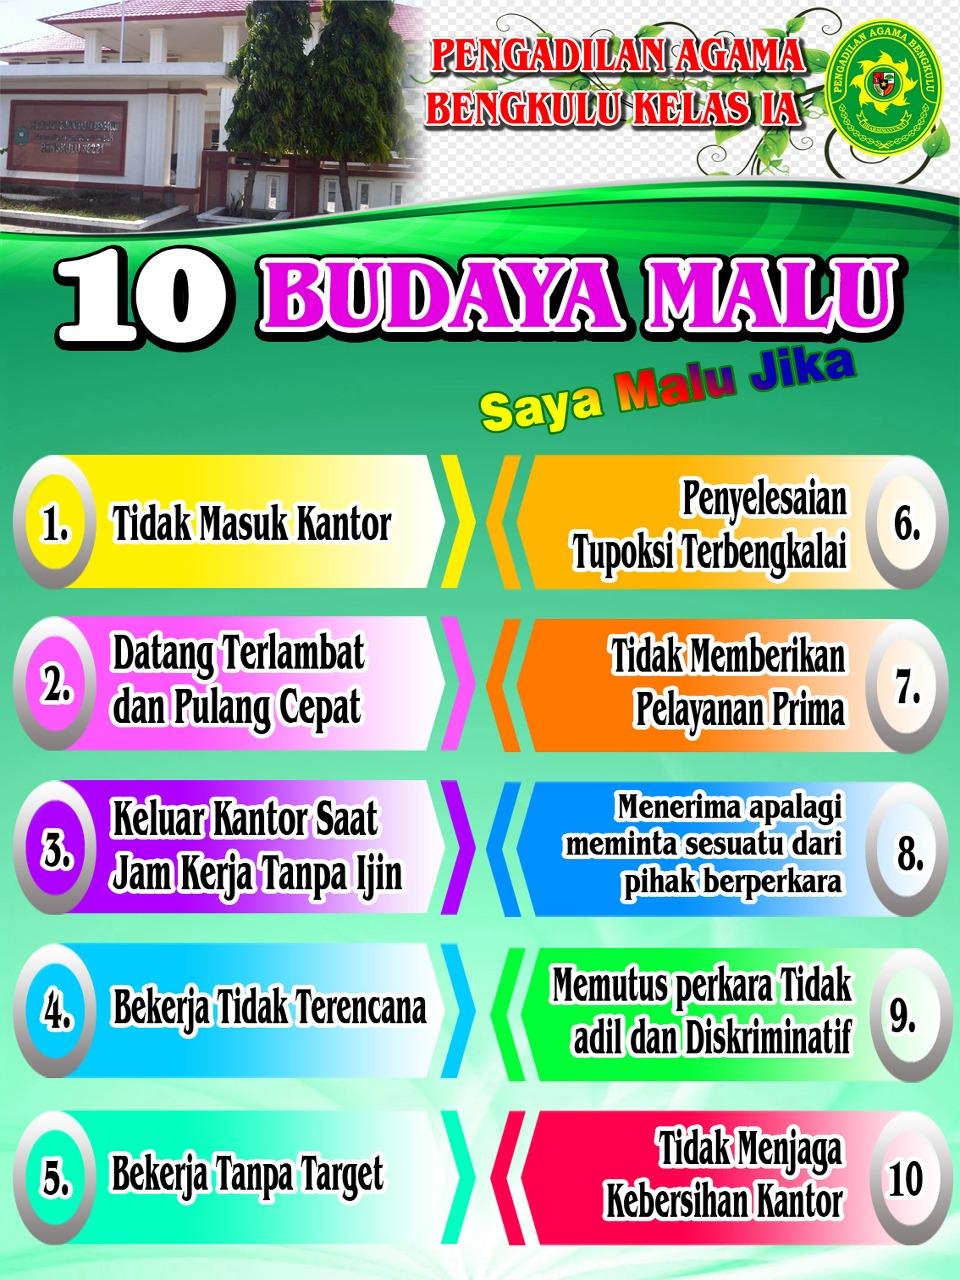 10 Budaya Malu Warga Pengadilan Agama Bengkulu